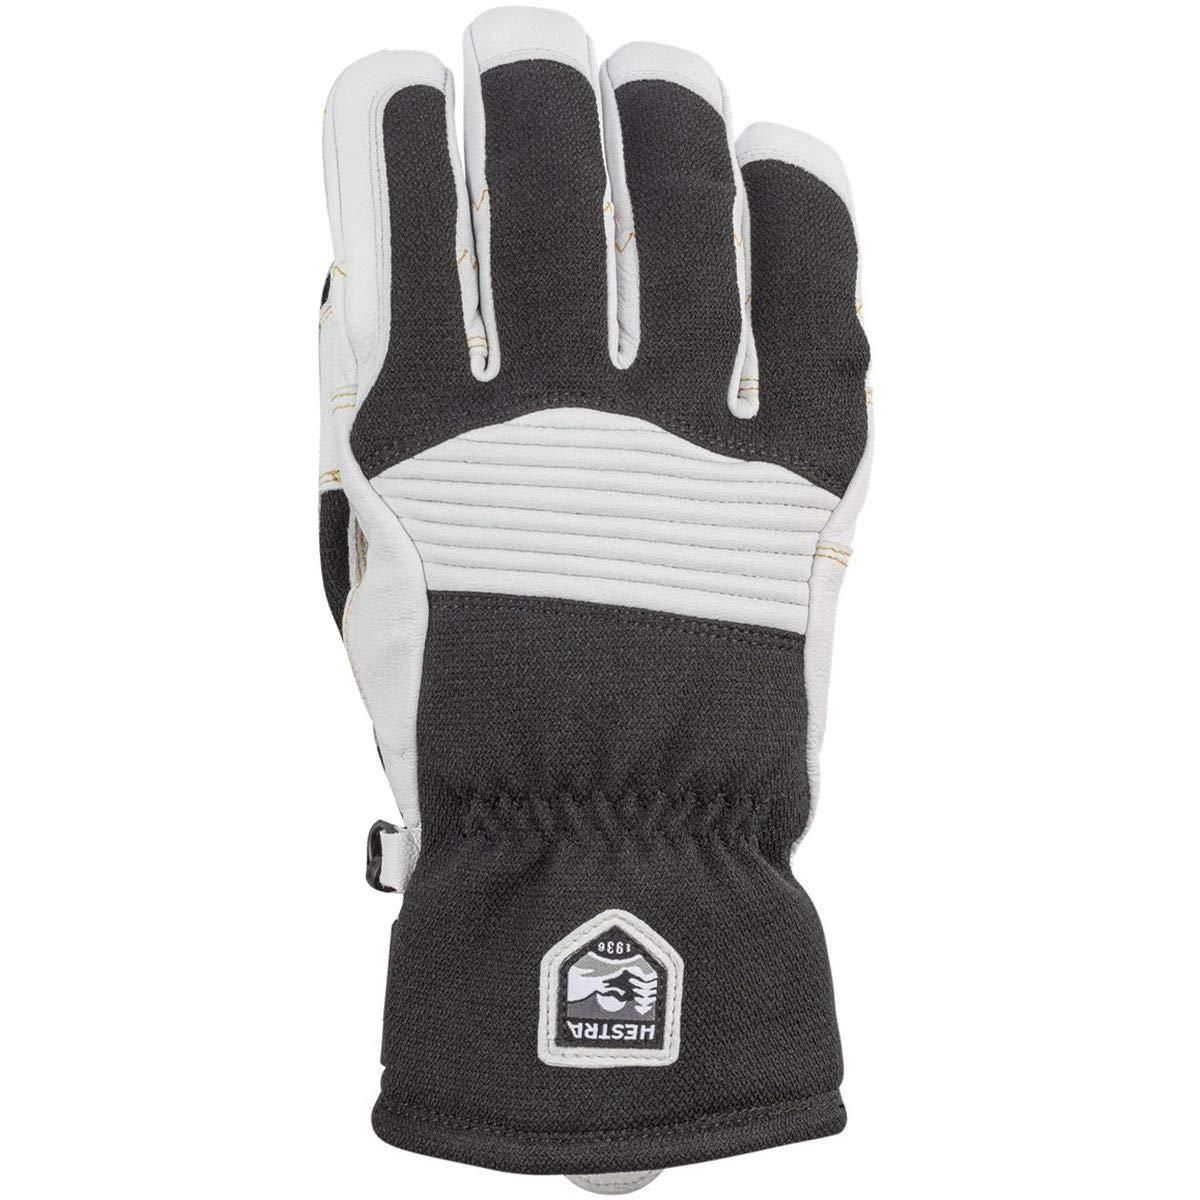 Hestra Army Leder Couloir Handschuhe fingerhandschuhe